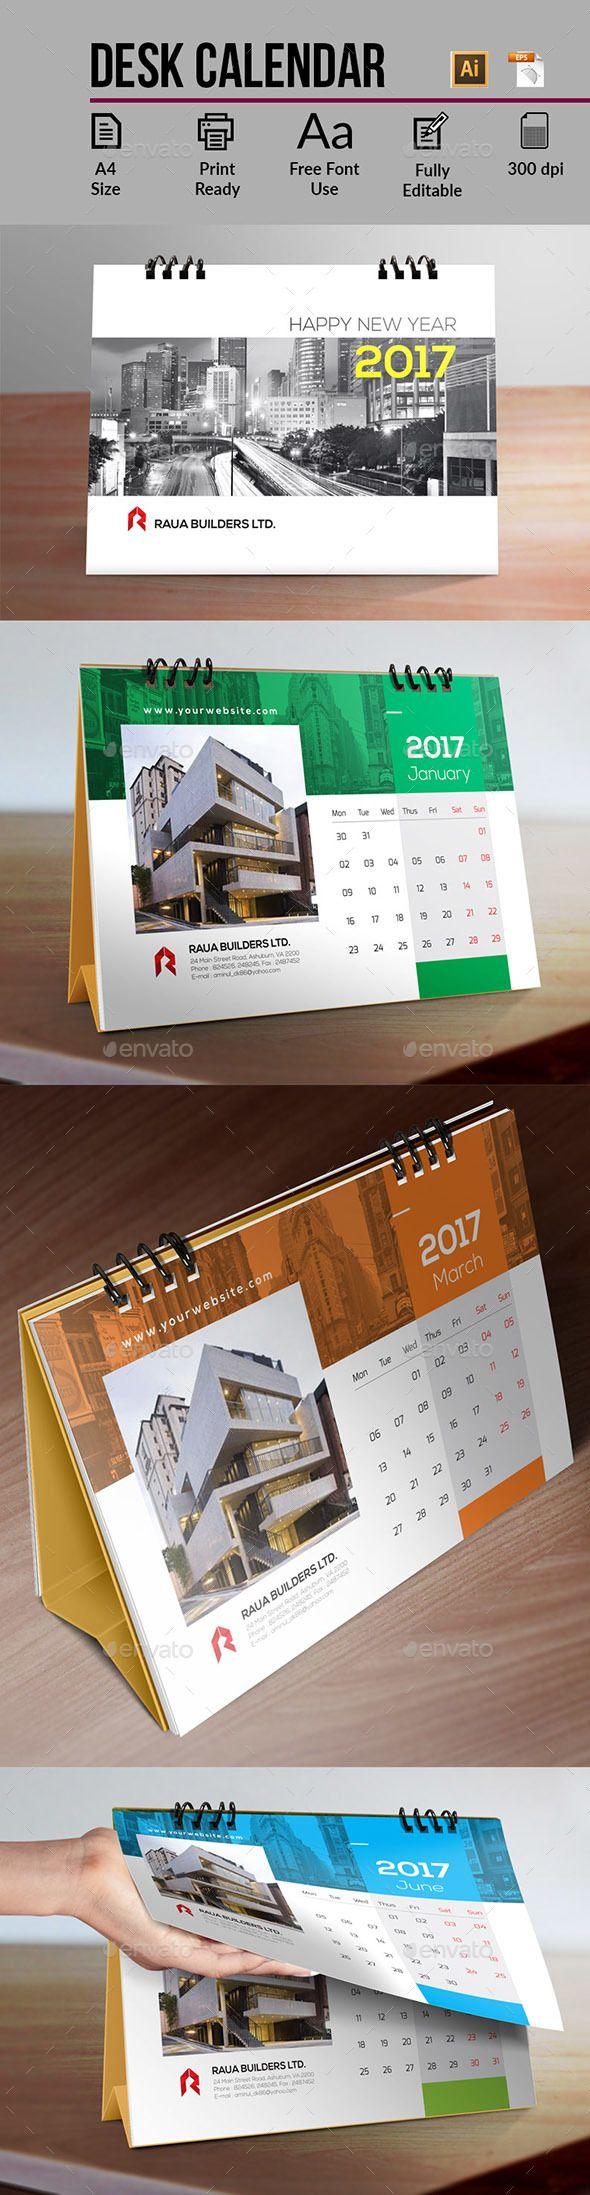 Calendar Ideas Corporate : Best ideas about desk calendars on pinterest diy